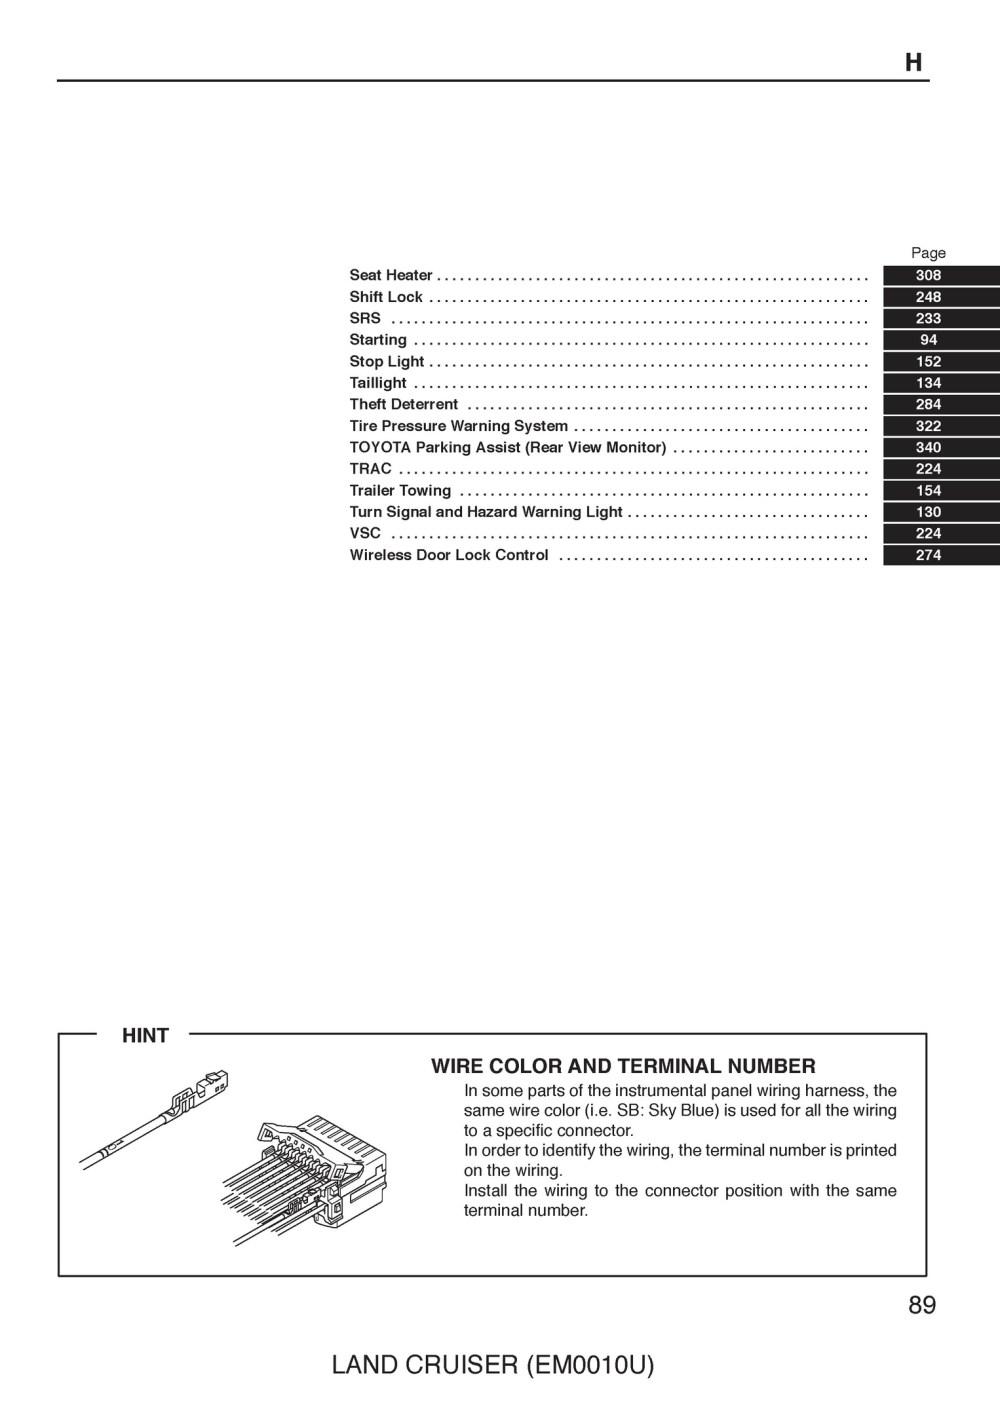 medium resolution of the folder contains 7 pdf files